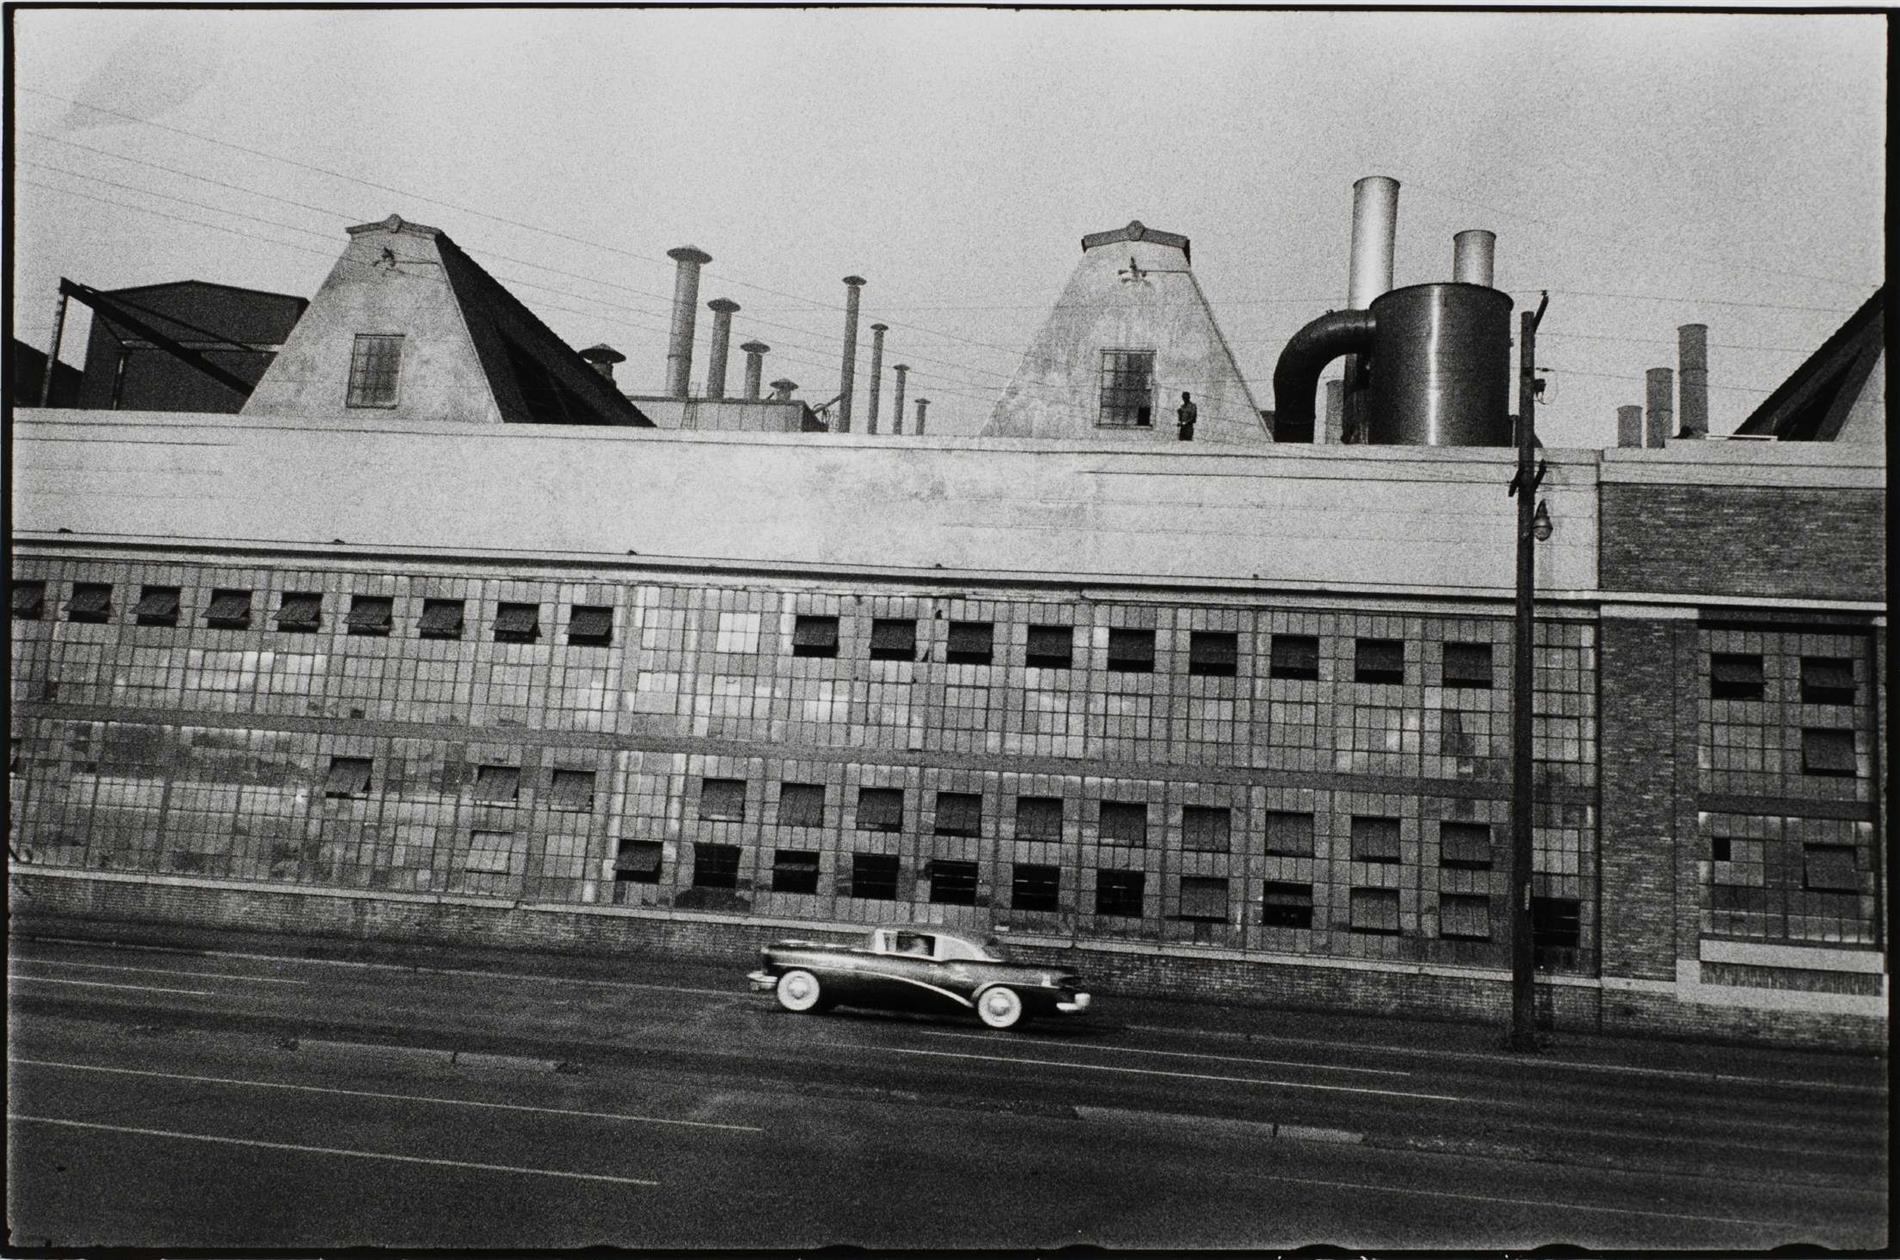 robert-frank-_detroit-river-rouge-plant_-1955-dia-no-1999-8 (Custom)